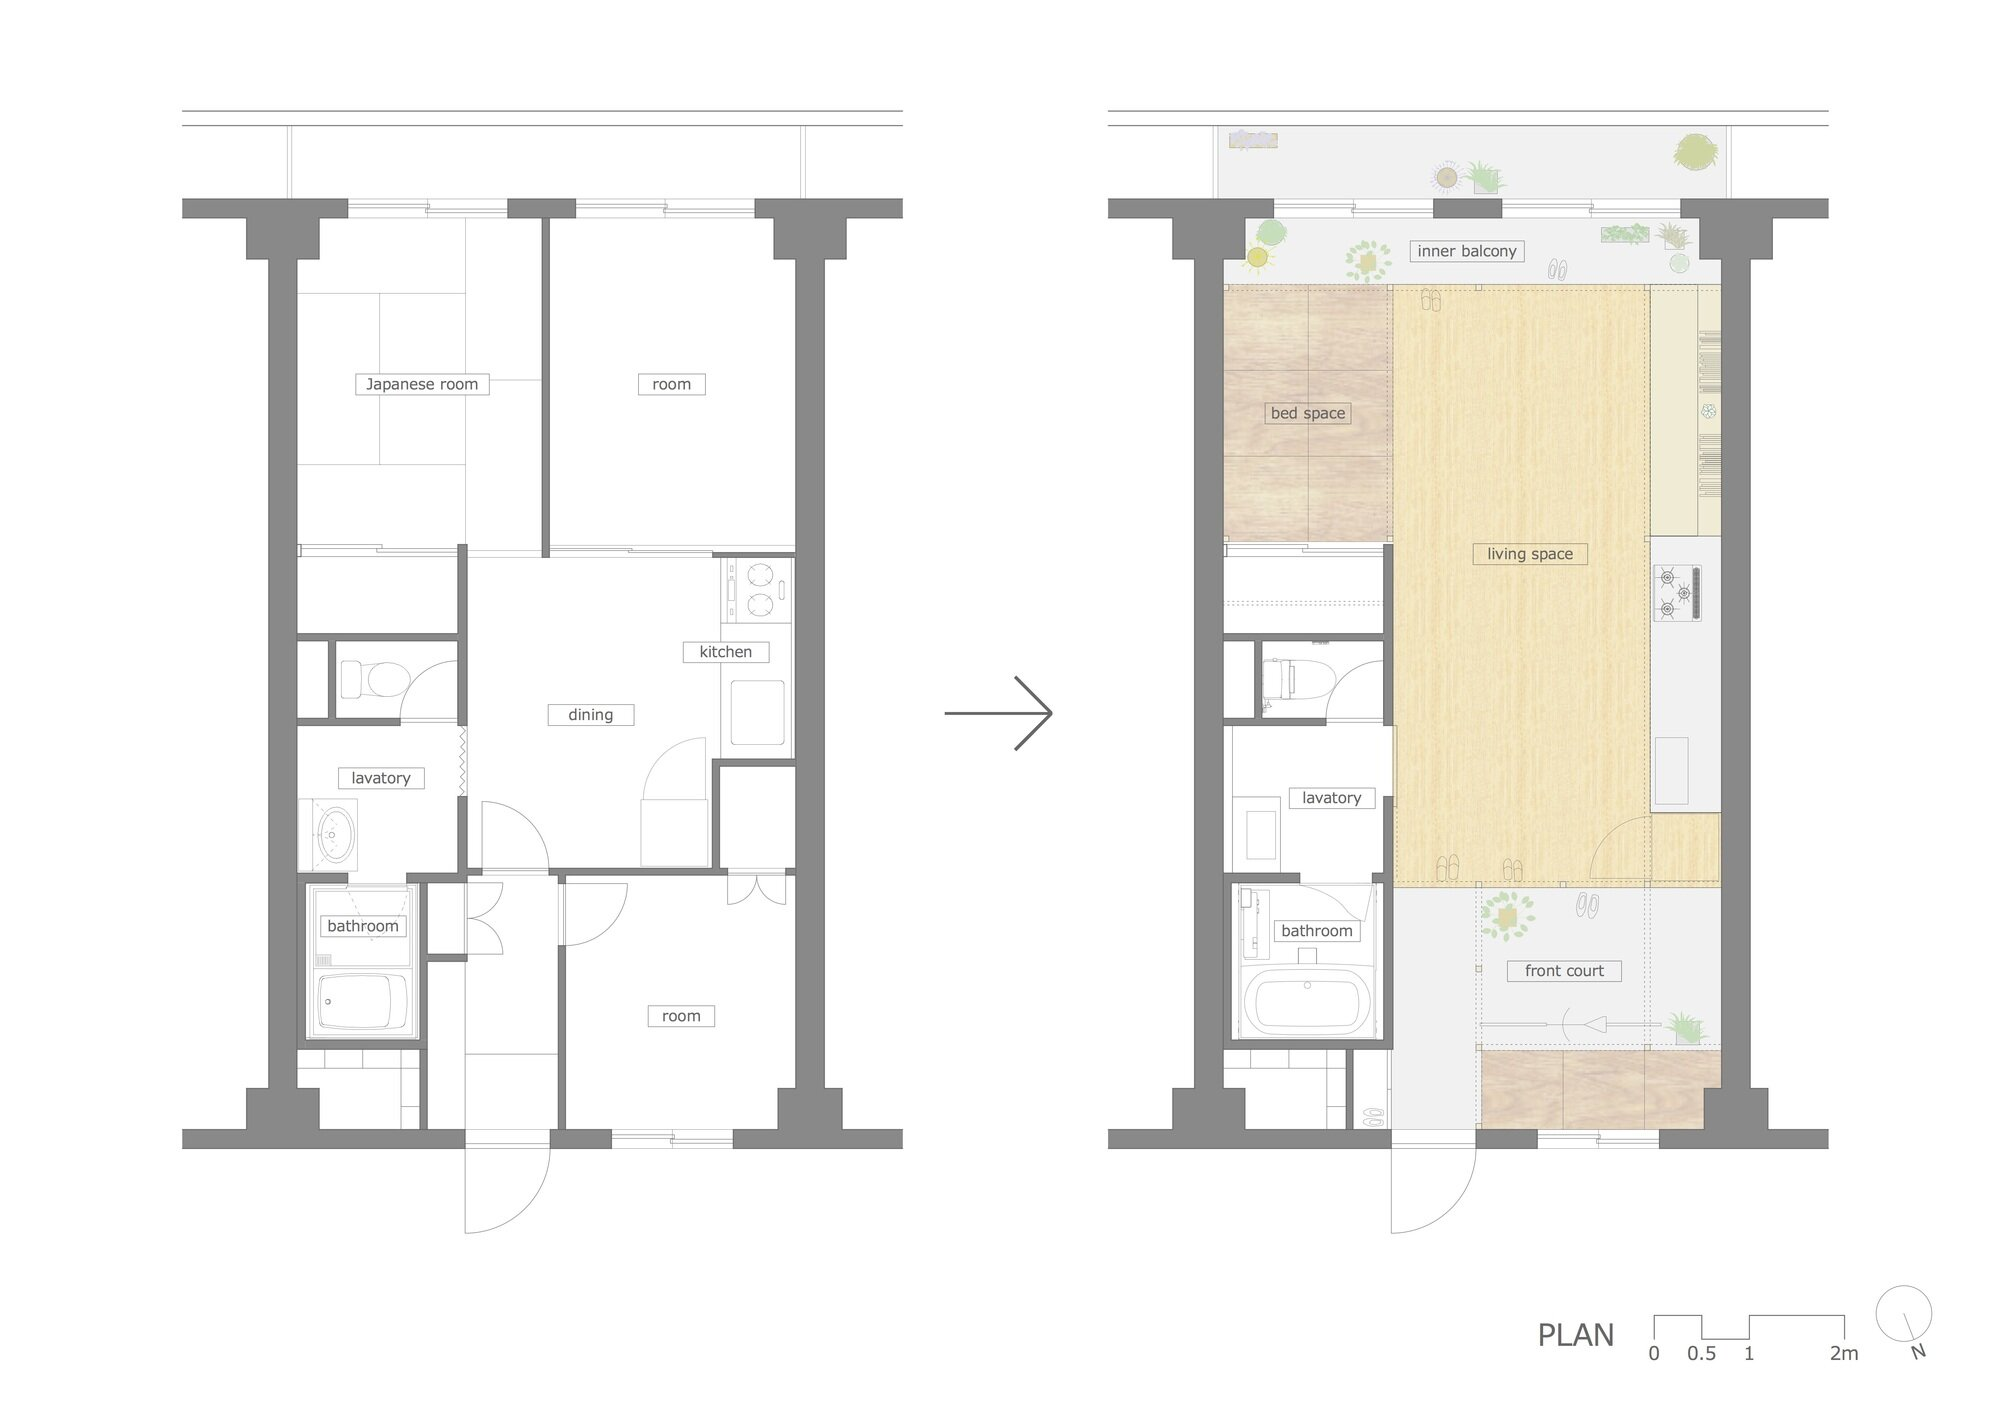 frame-house-peak-studio-kawasaki-japan-floor-plans-humble-homes